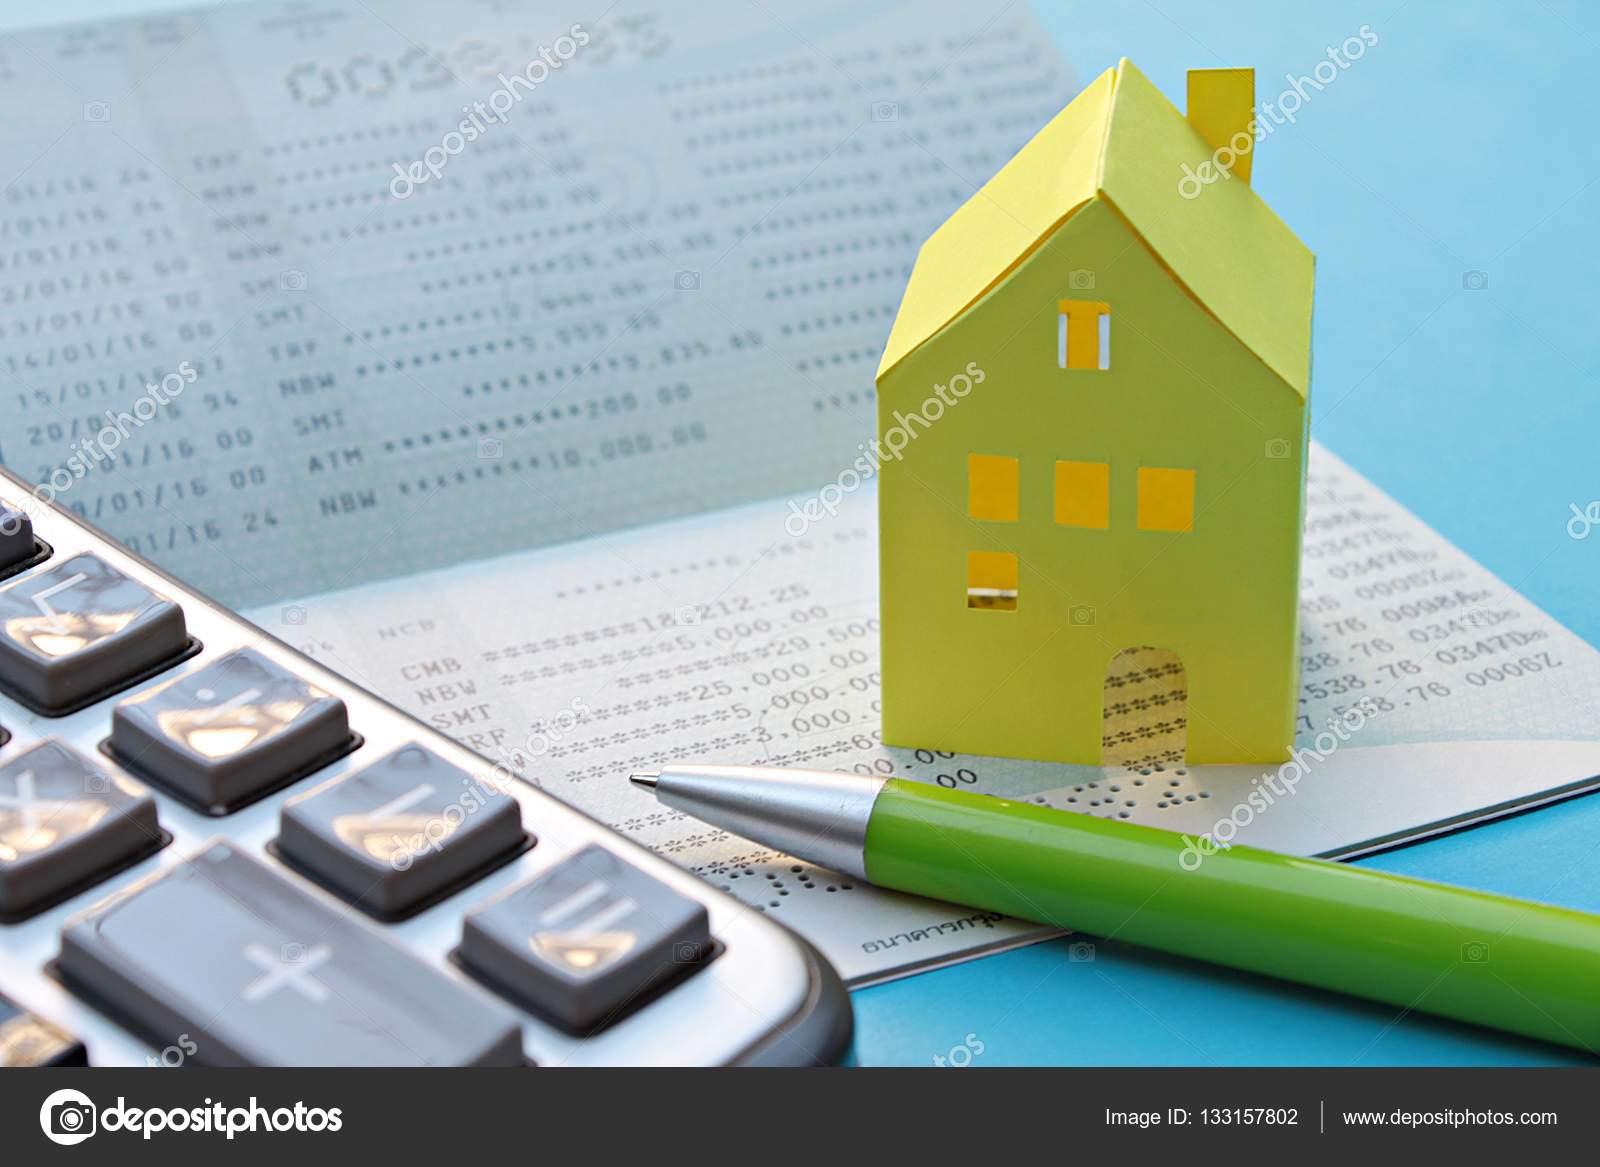 Savings account passbook calculator pen and yellow paper house – Savings Account Calculator